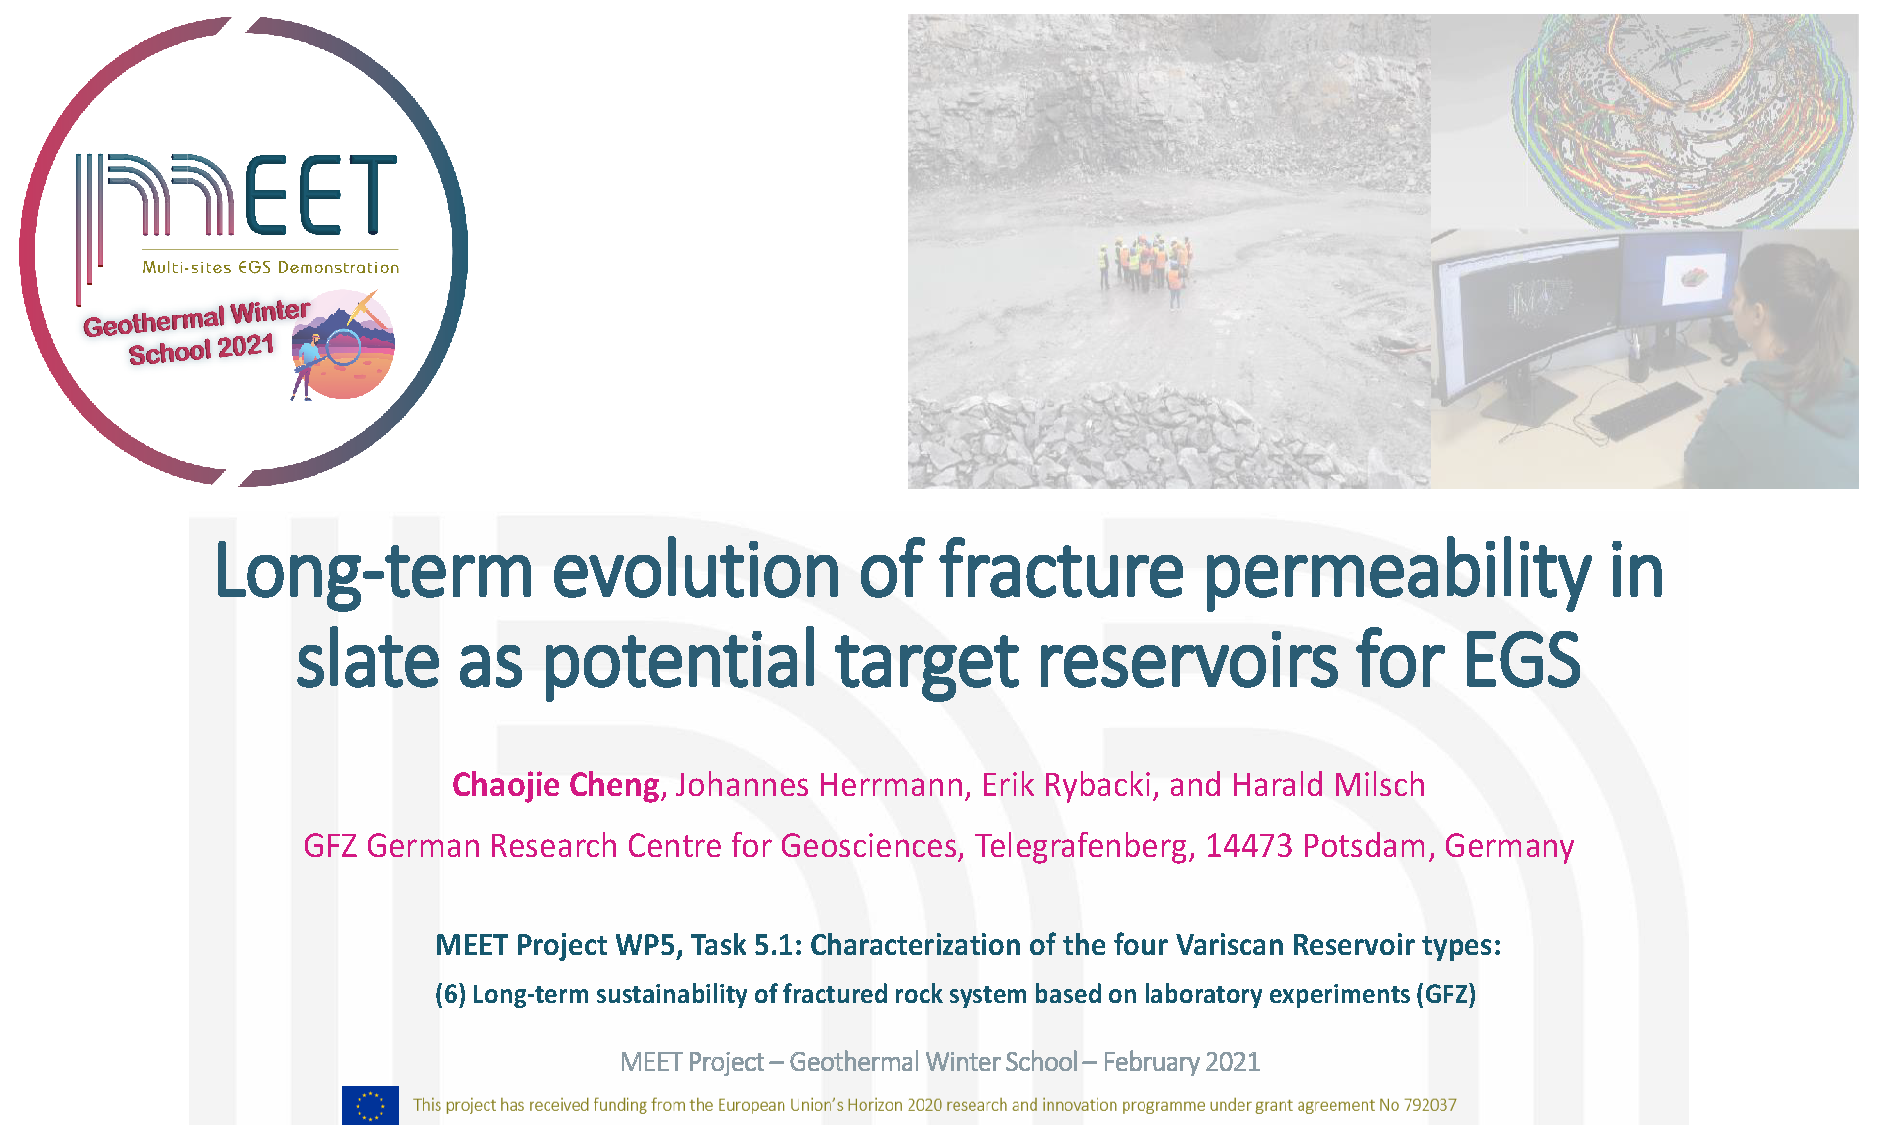 MEET Geothermal Winter School Chaojie Cheng first slide visual